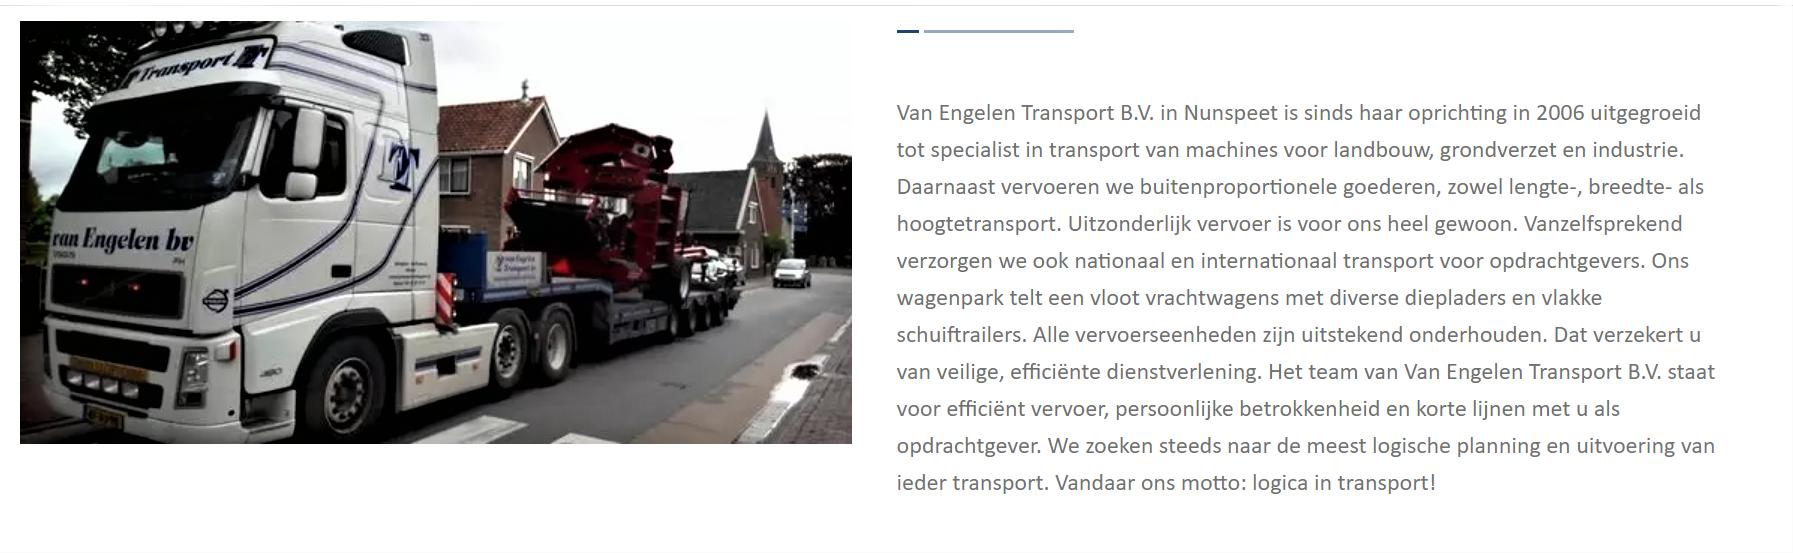 Transport--